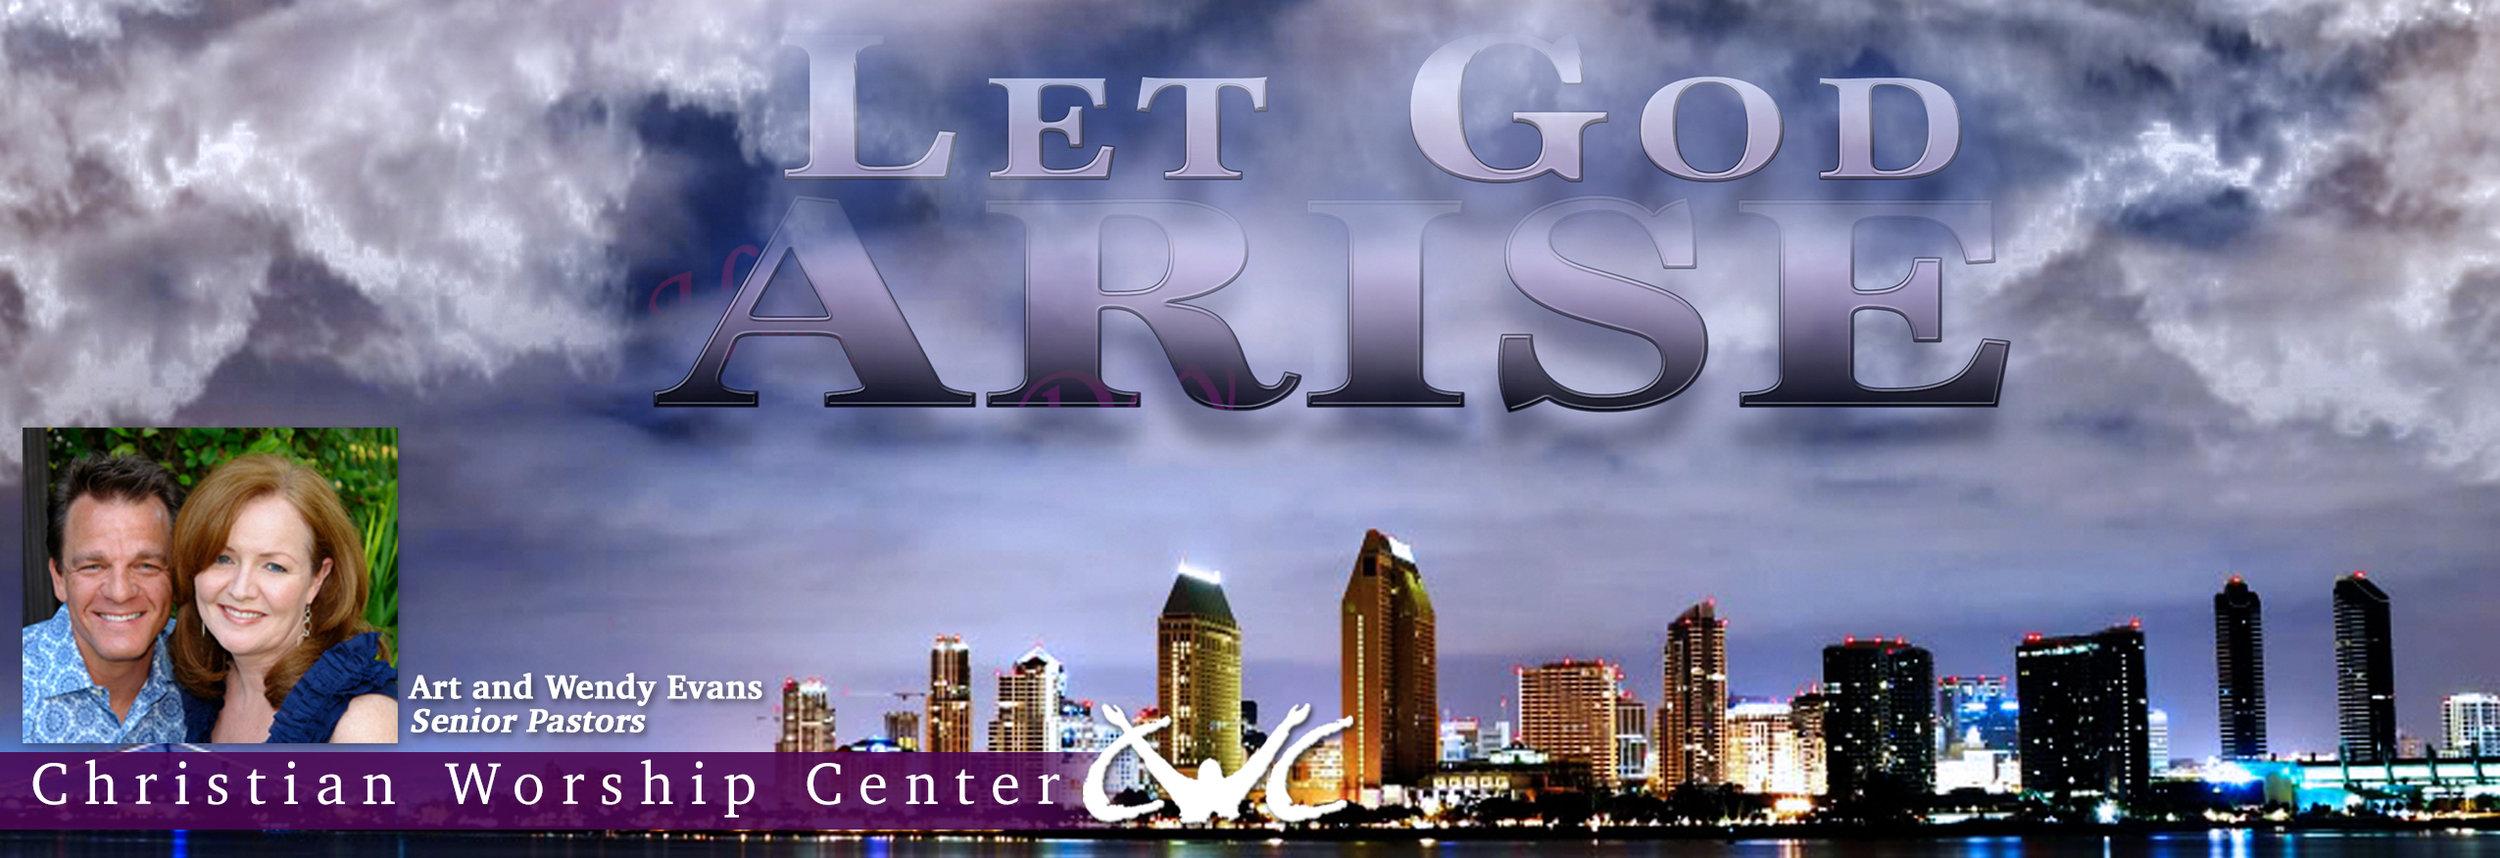 Let God Arise Banner.jpg